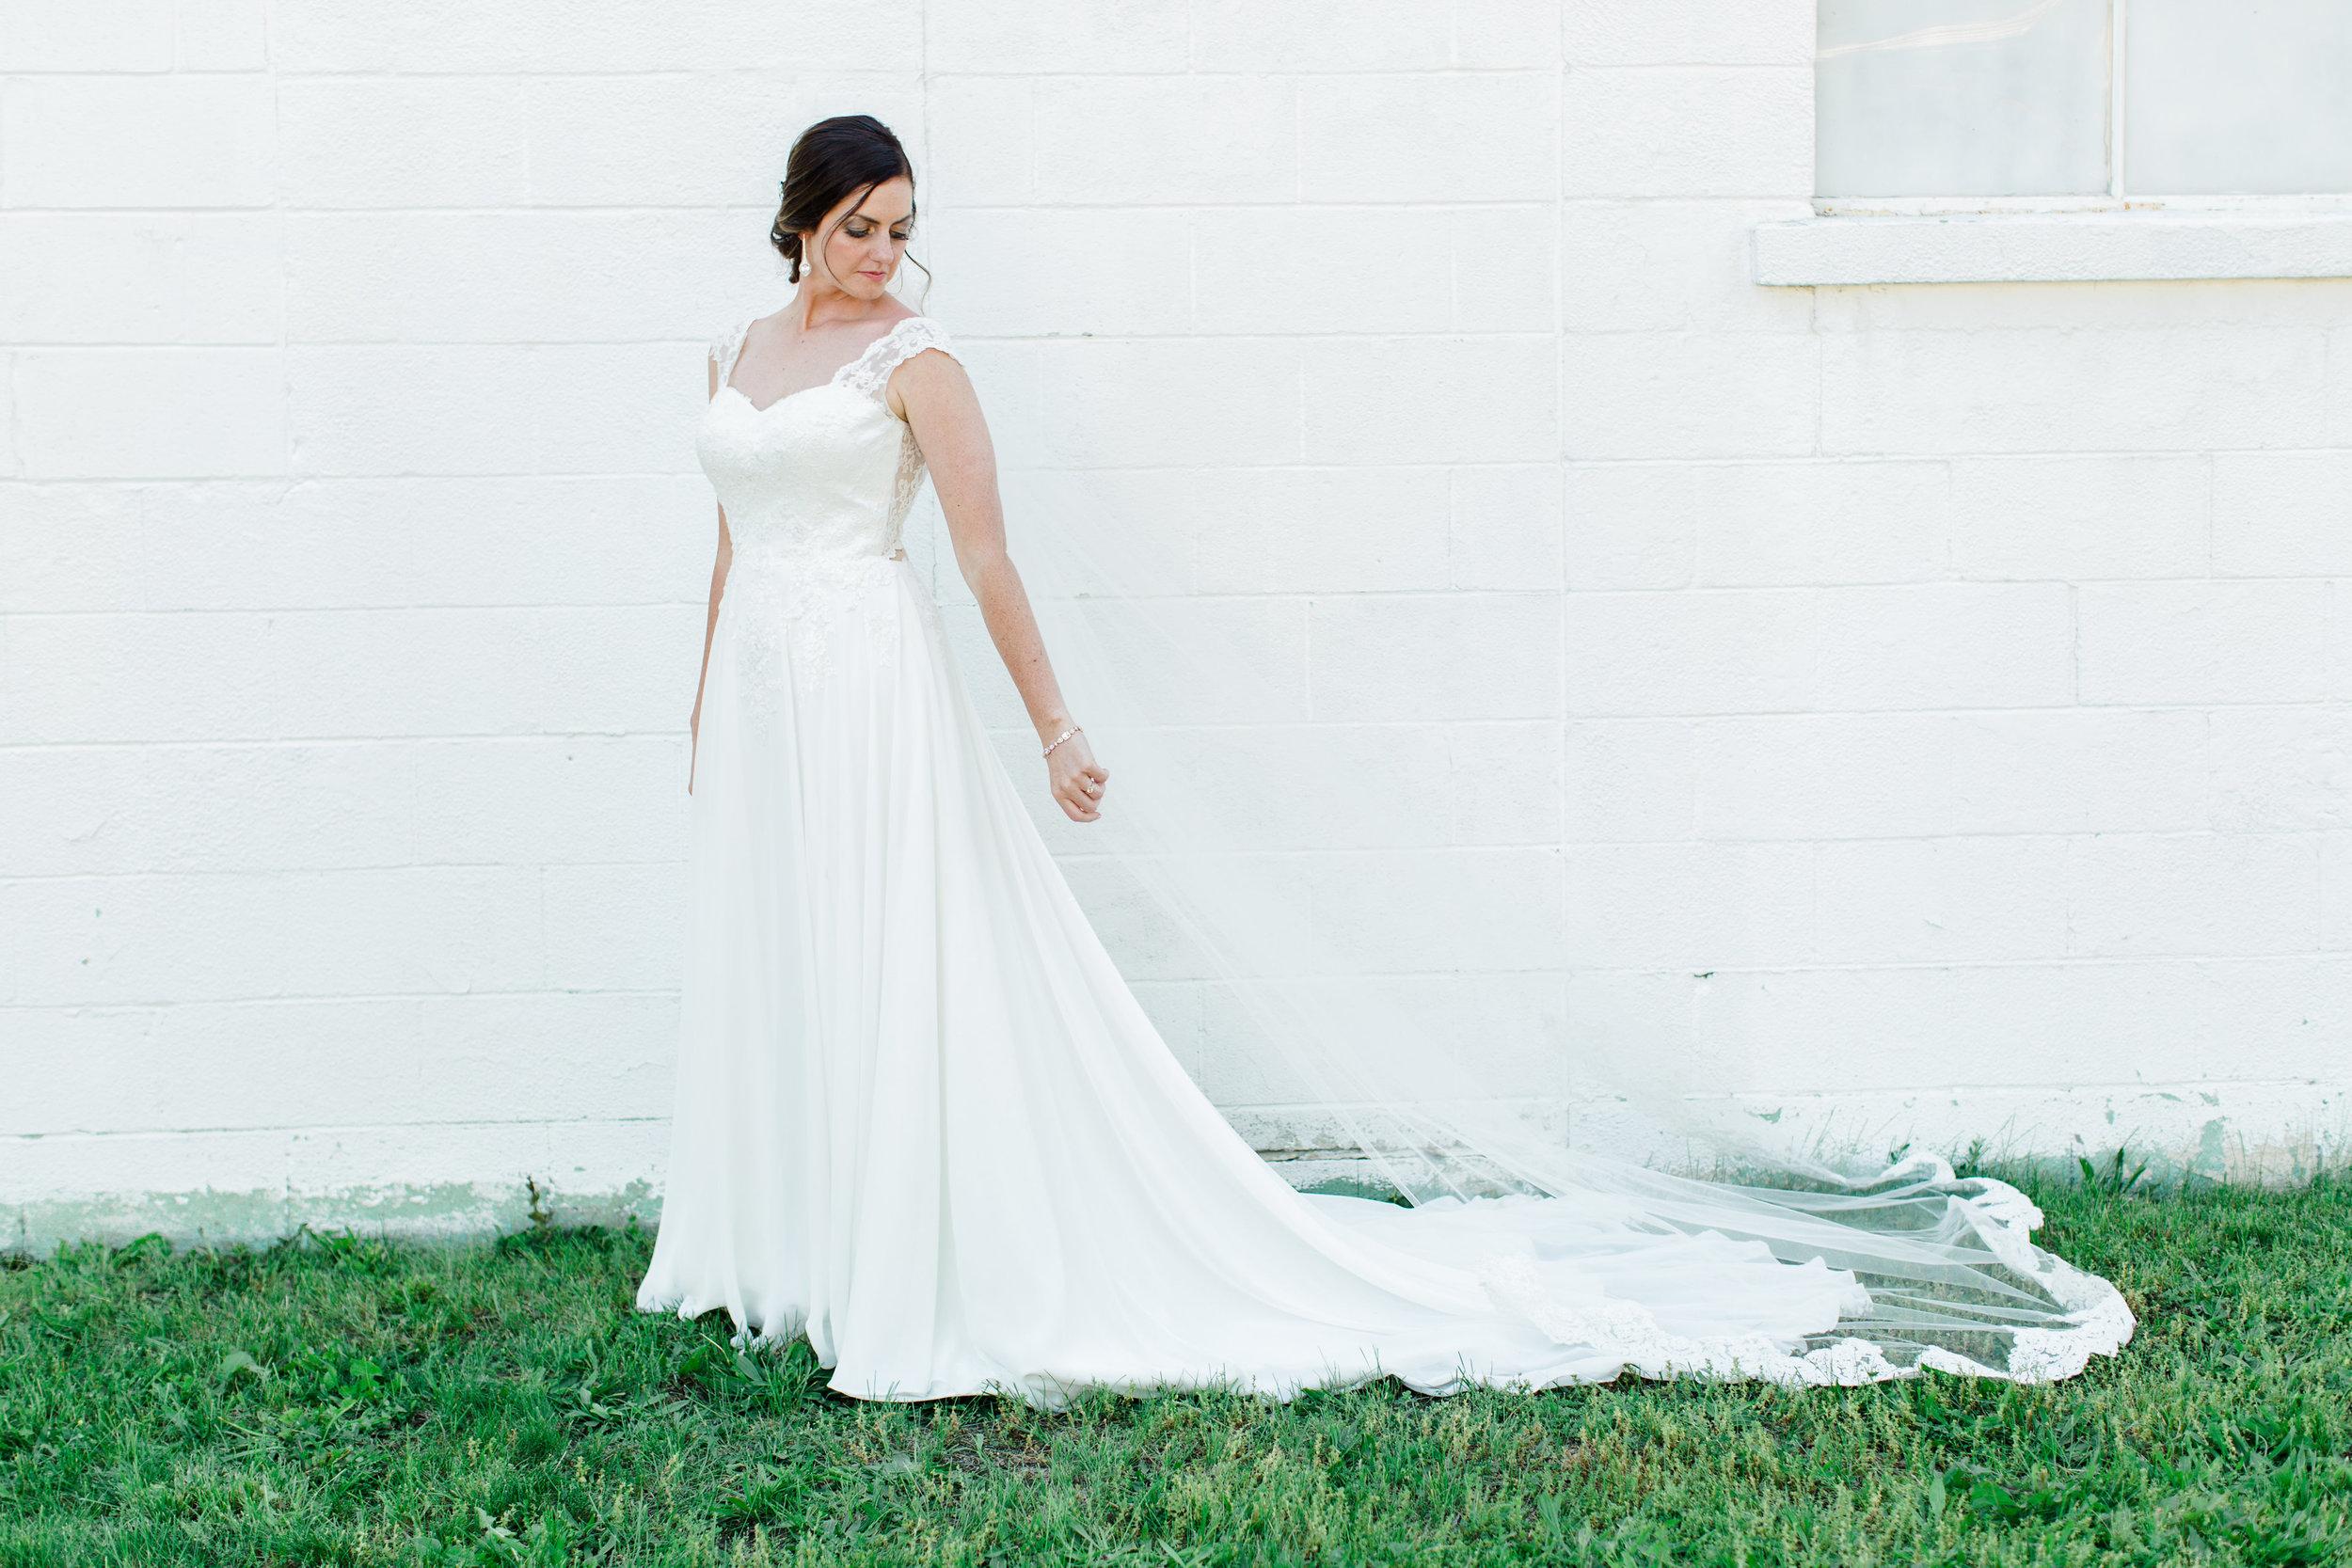 Julius+Wedding+BrideGroomb-14.jpg